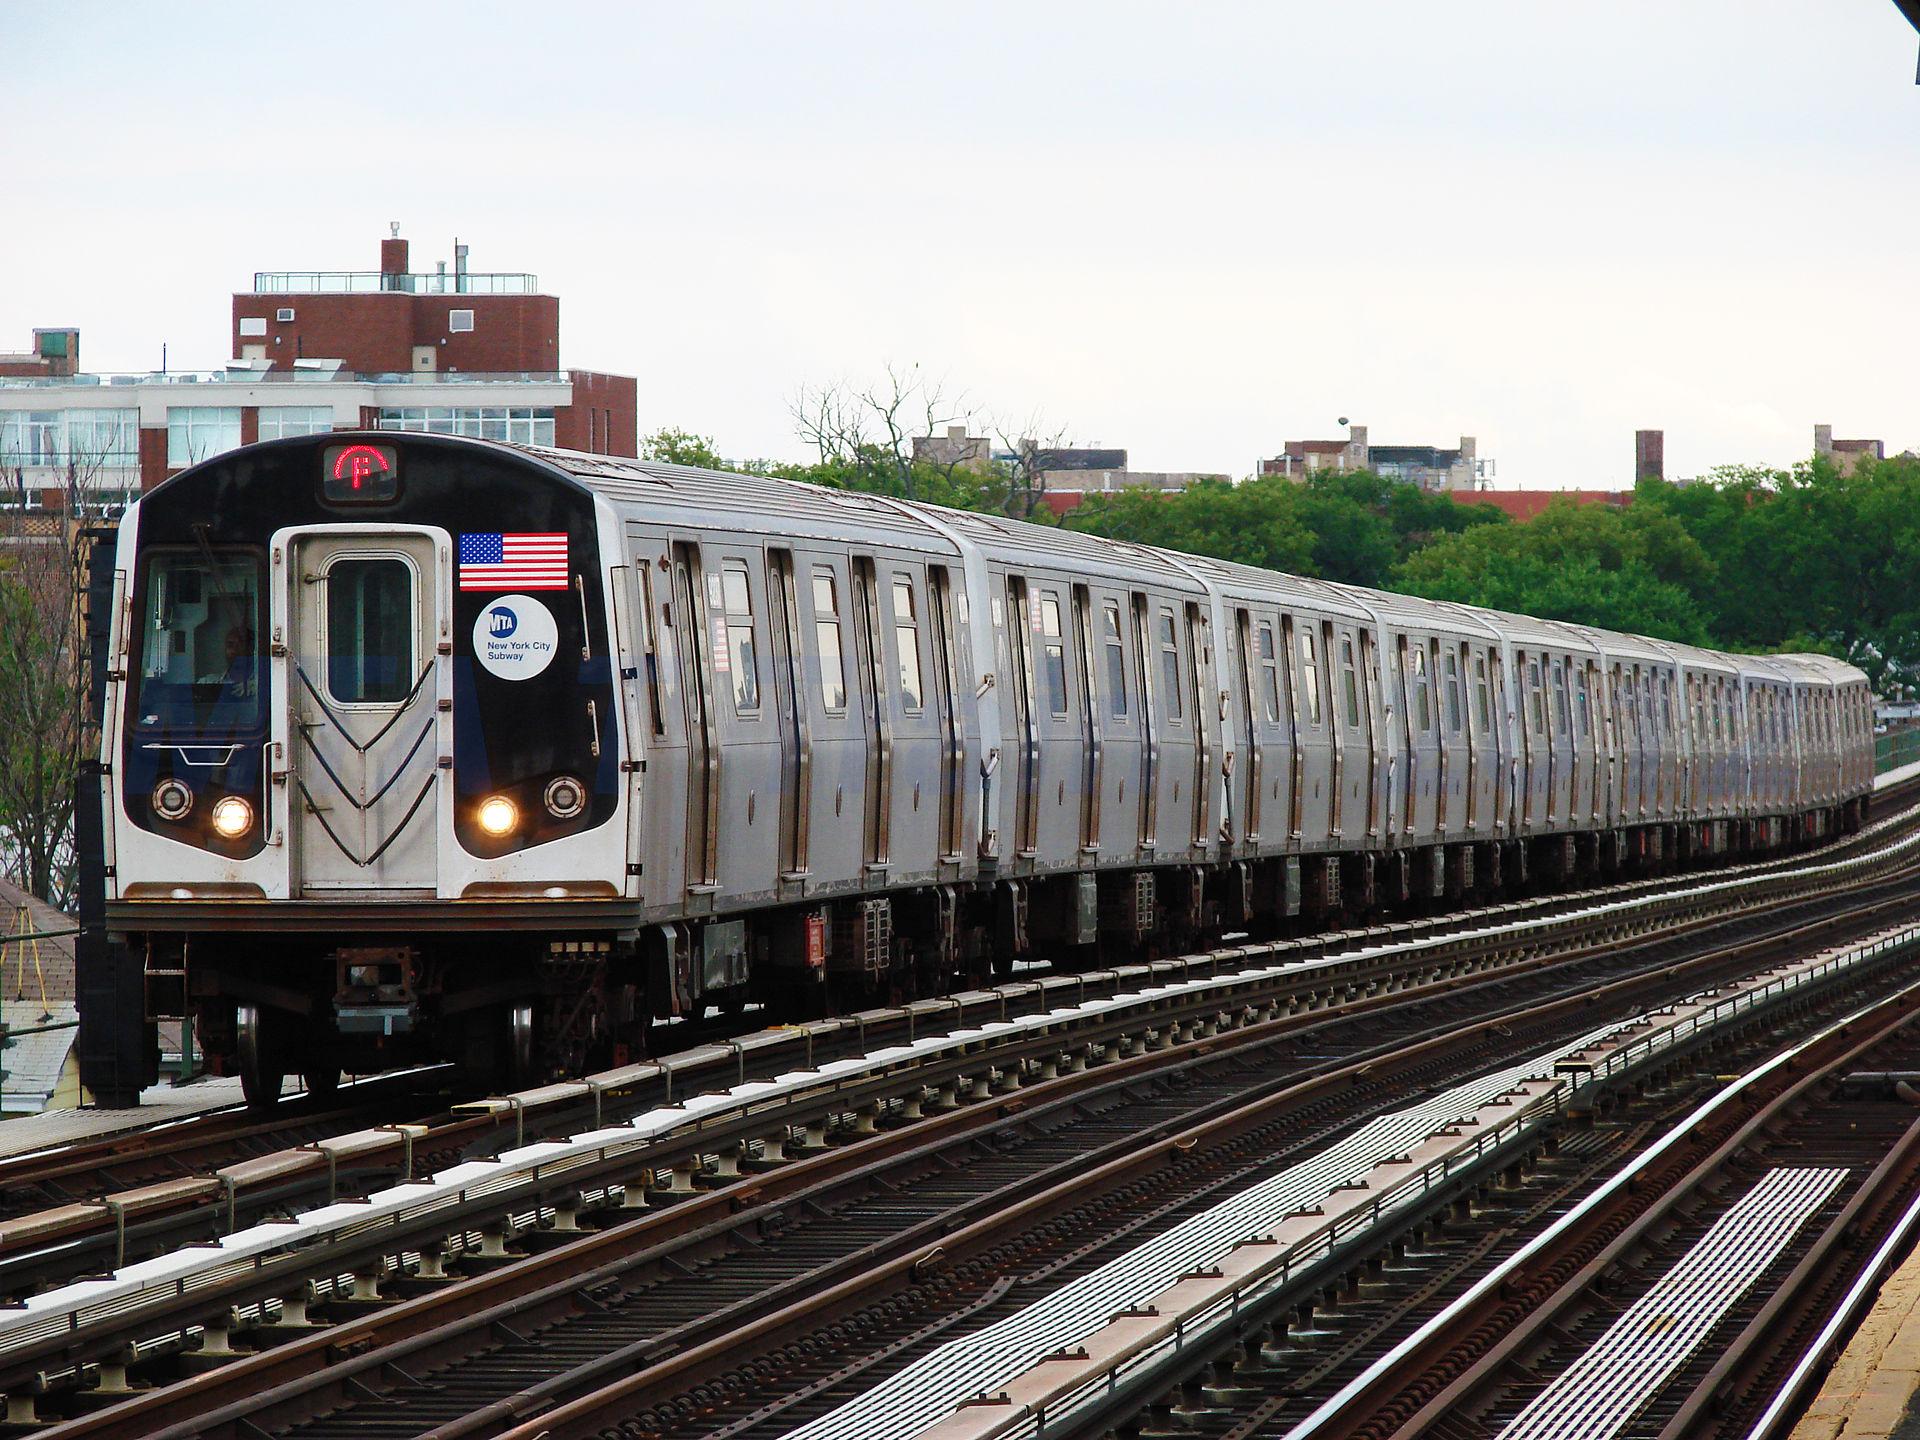 F Train Schedule To Coney Island